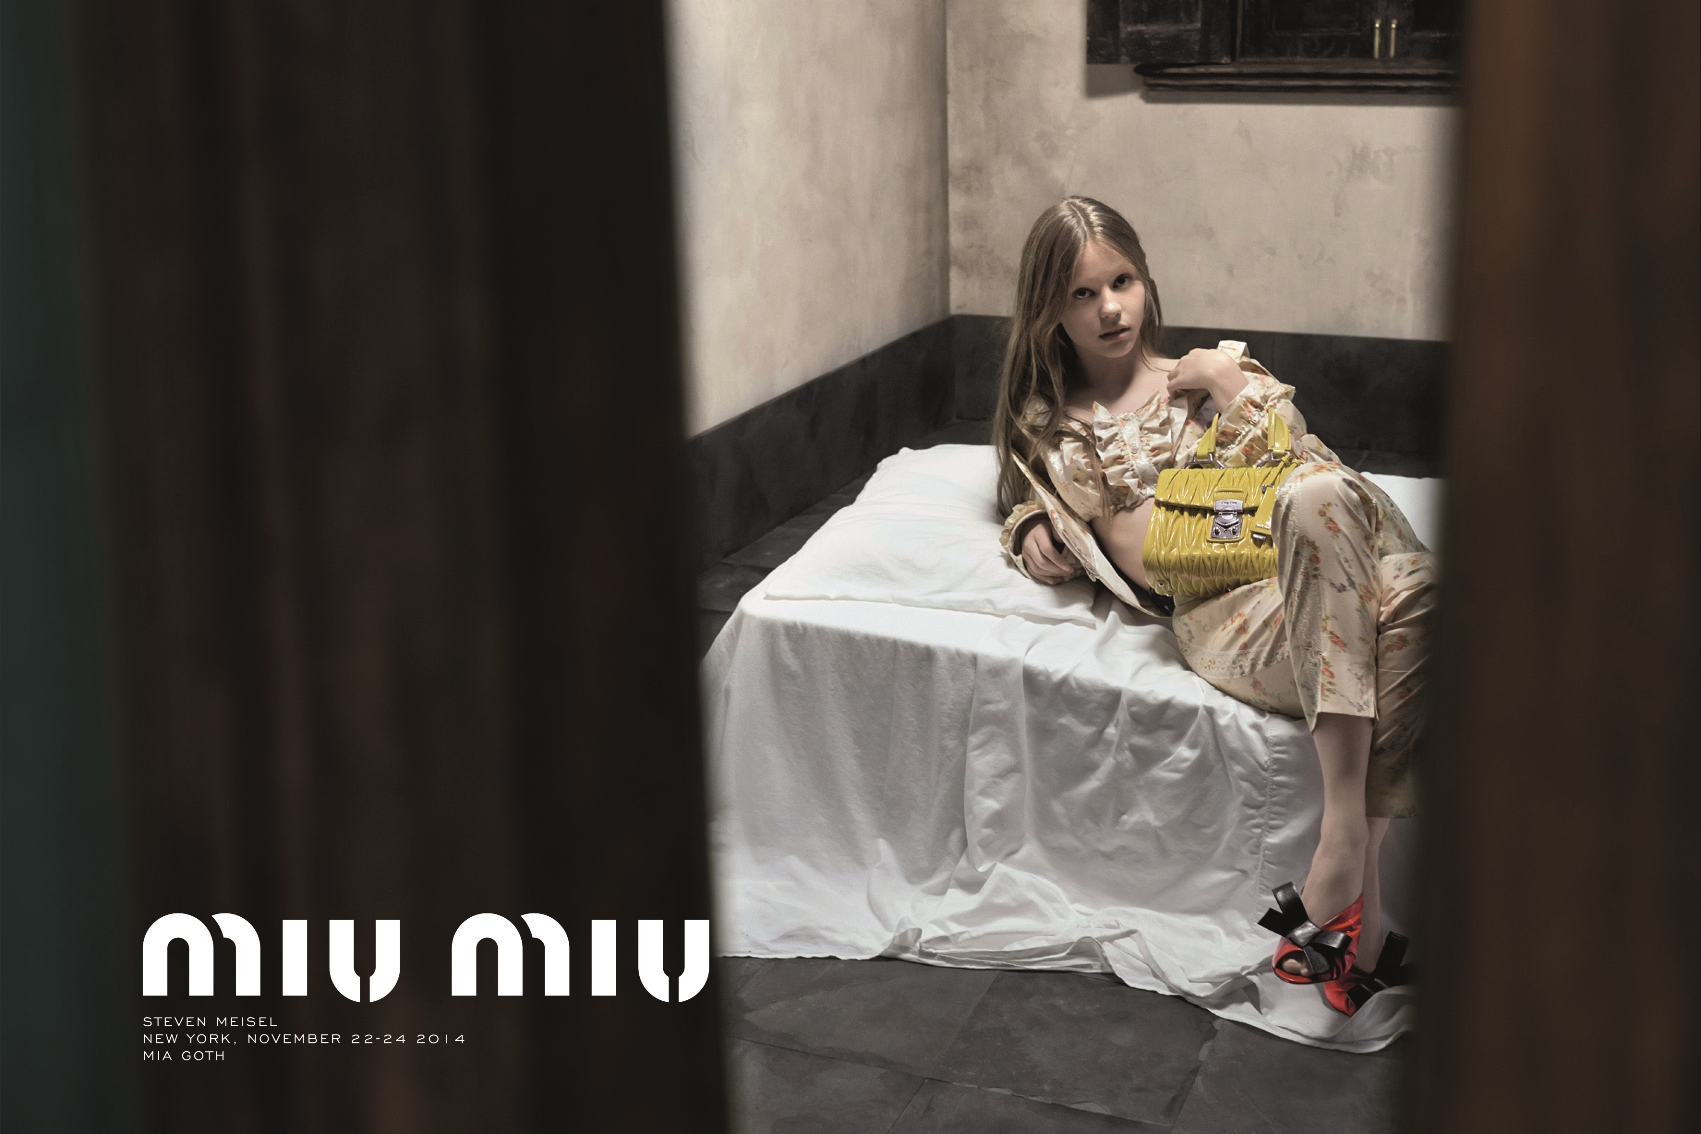 Miu Miu Spring Summer 2015 Adv. Campaign_02